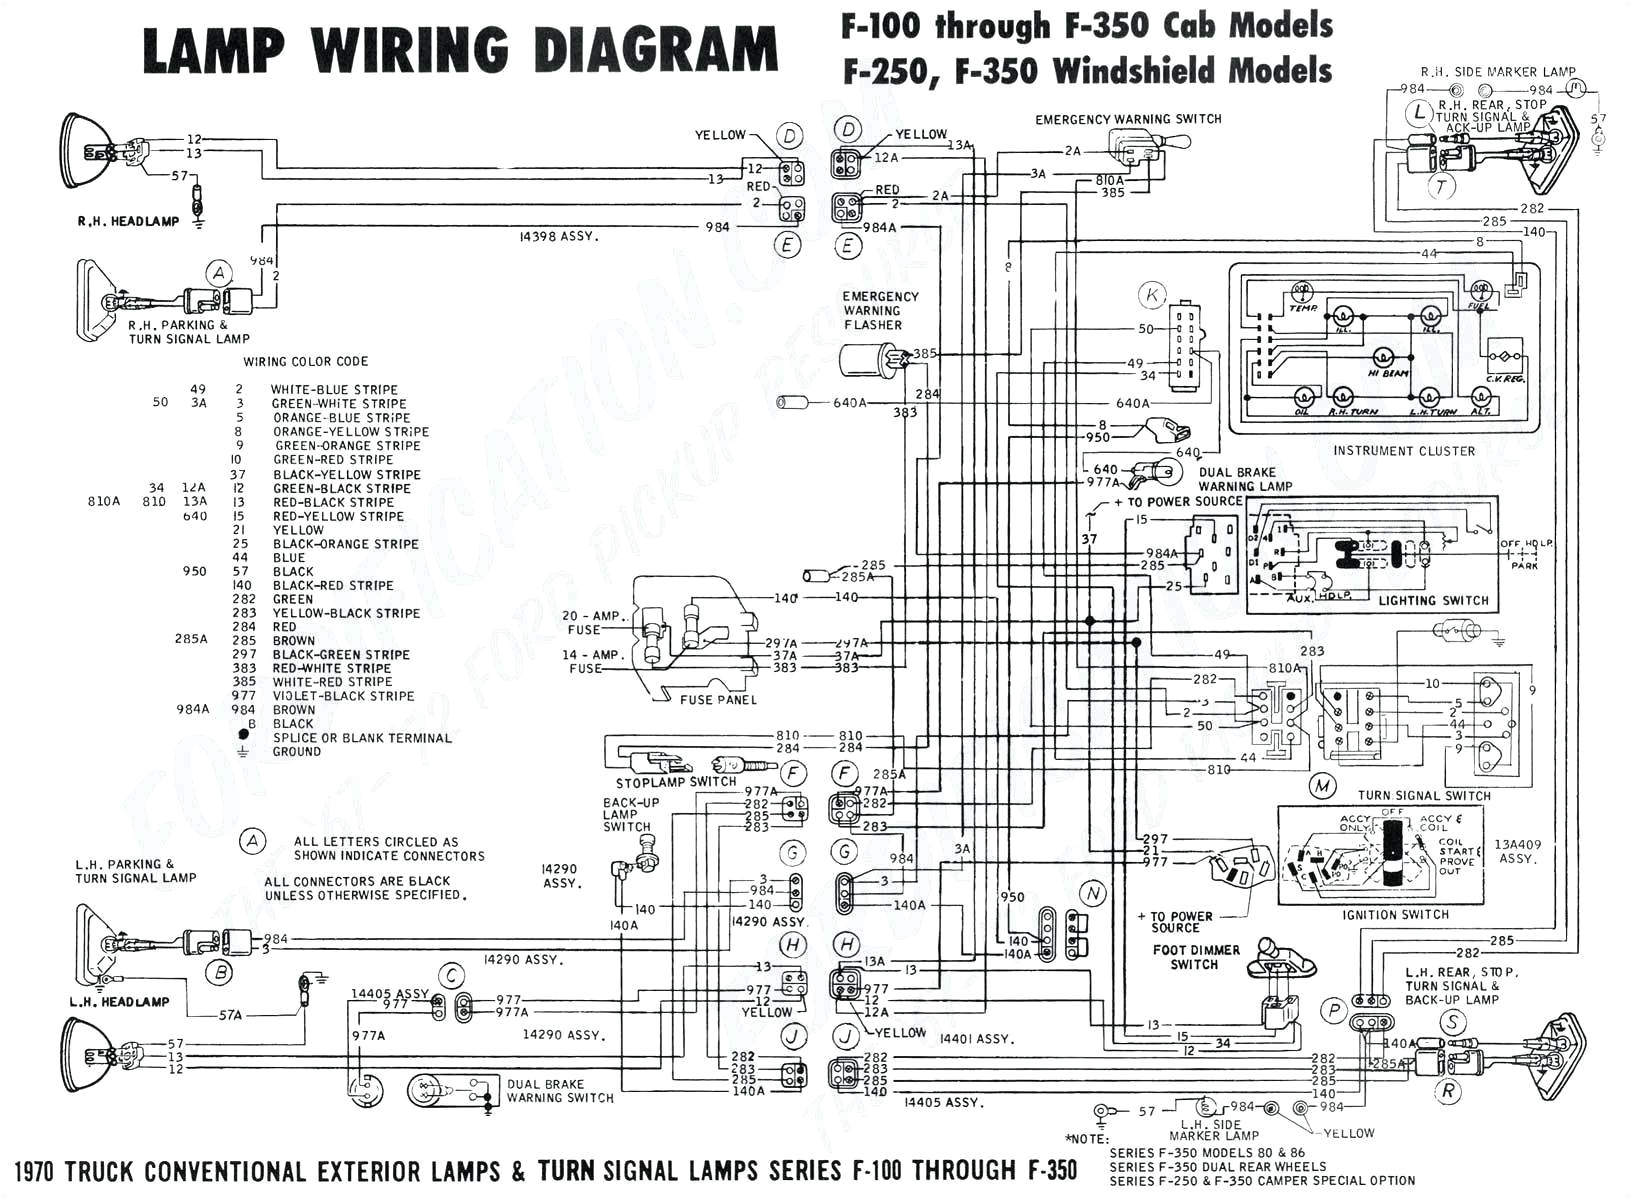 z520 wiring diagram wiring diagram var z520 wiring diagram